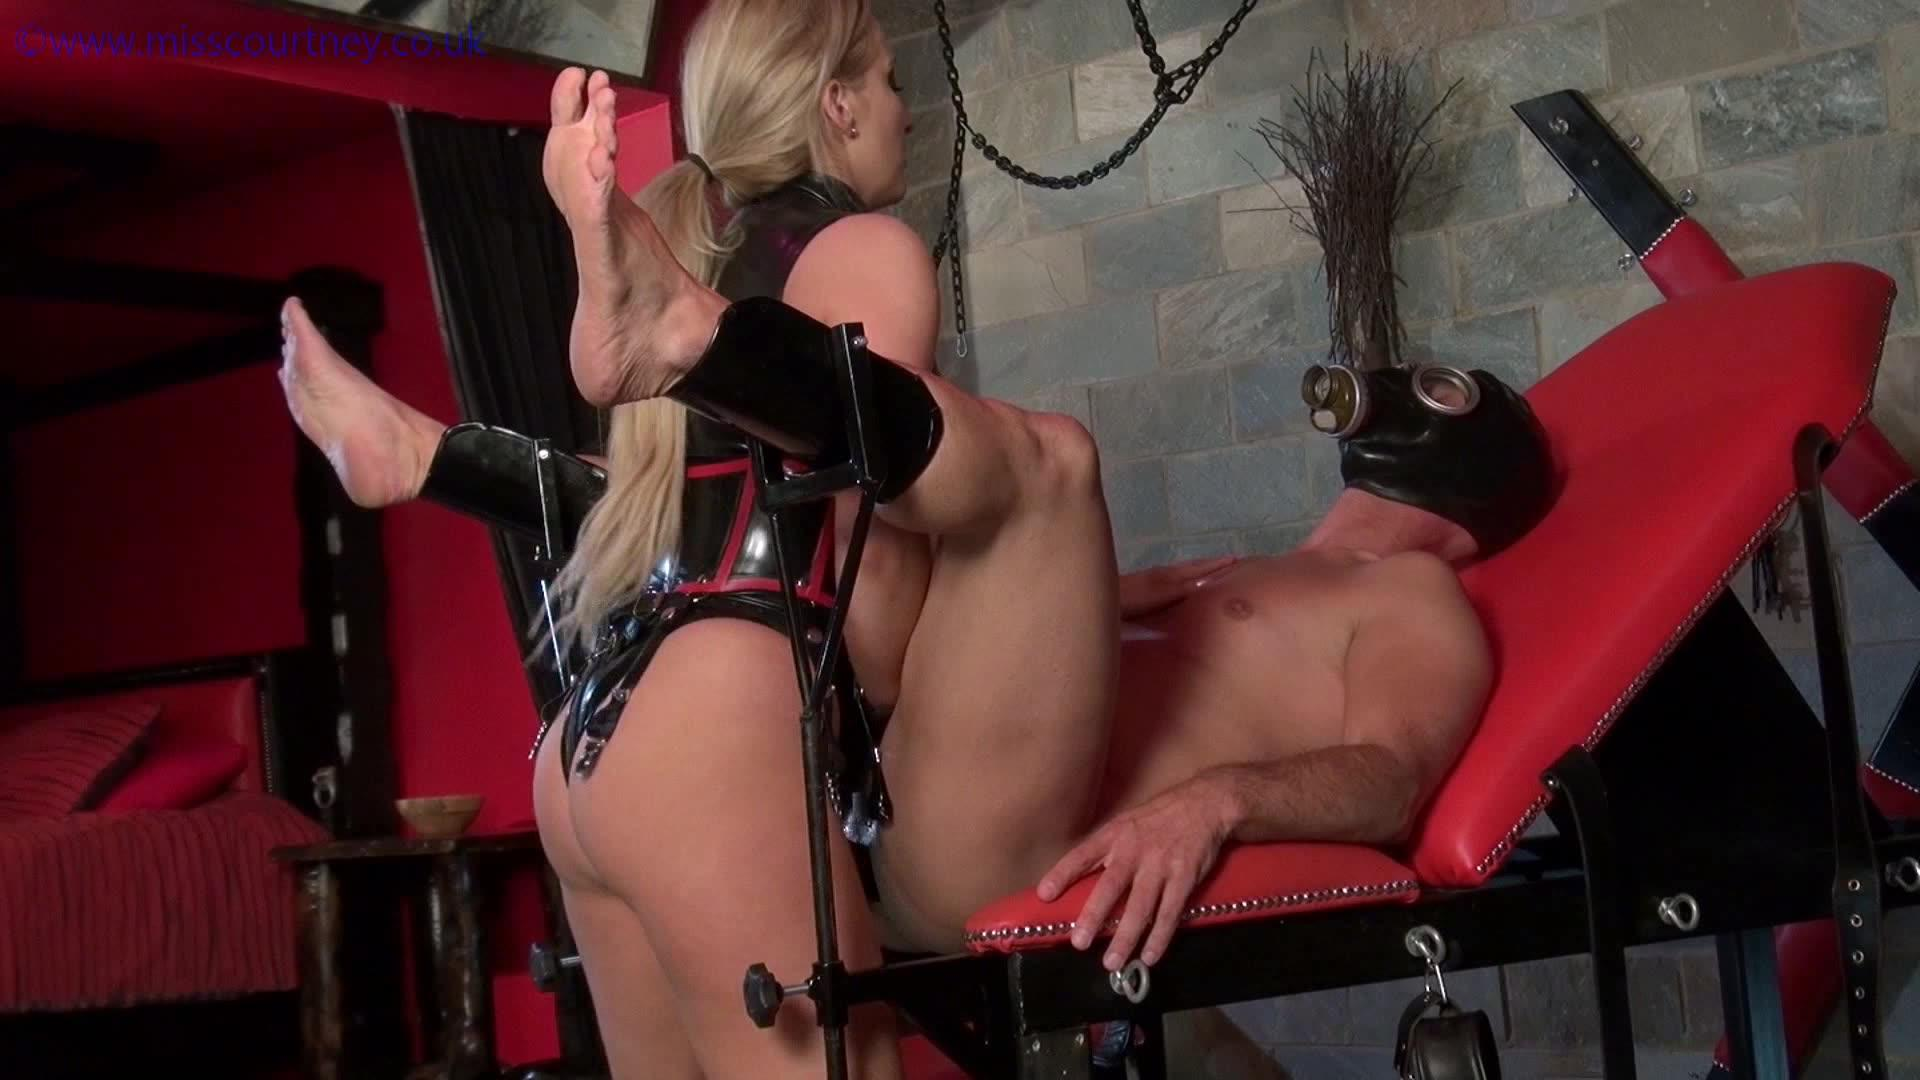 Black dominatrix strapon torture and anal punishment sadistic photo